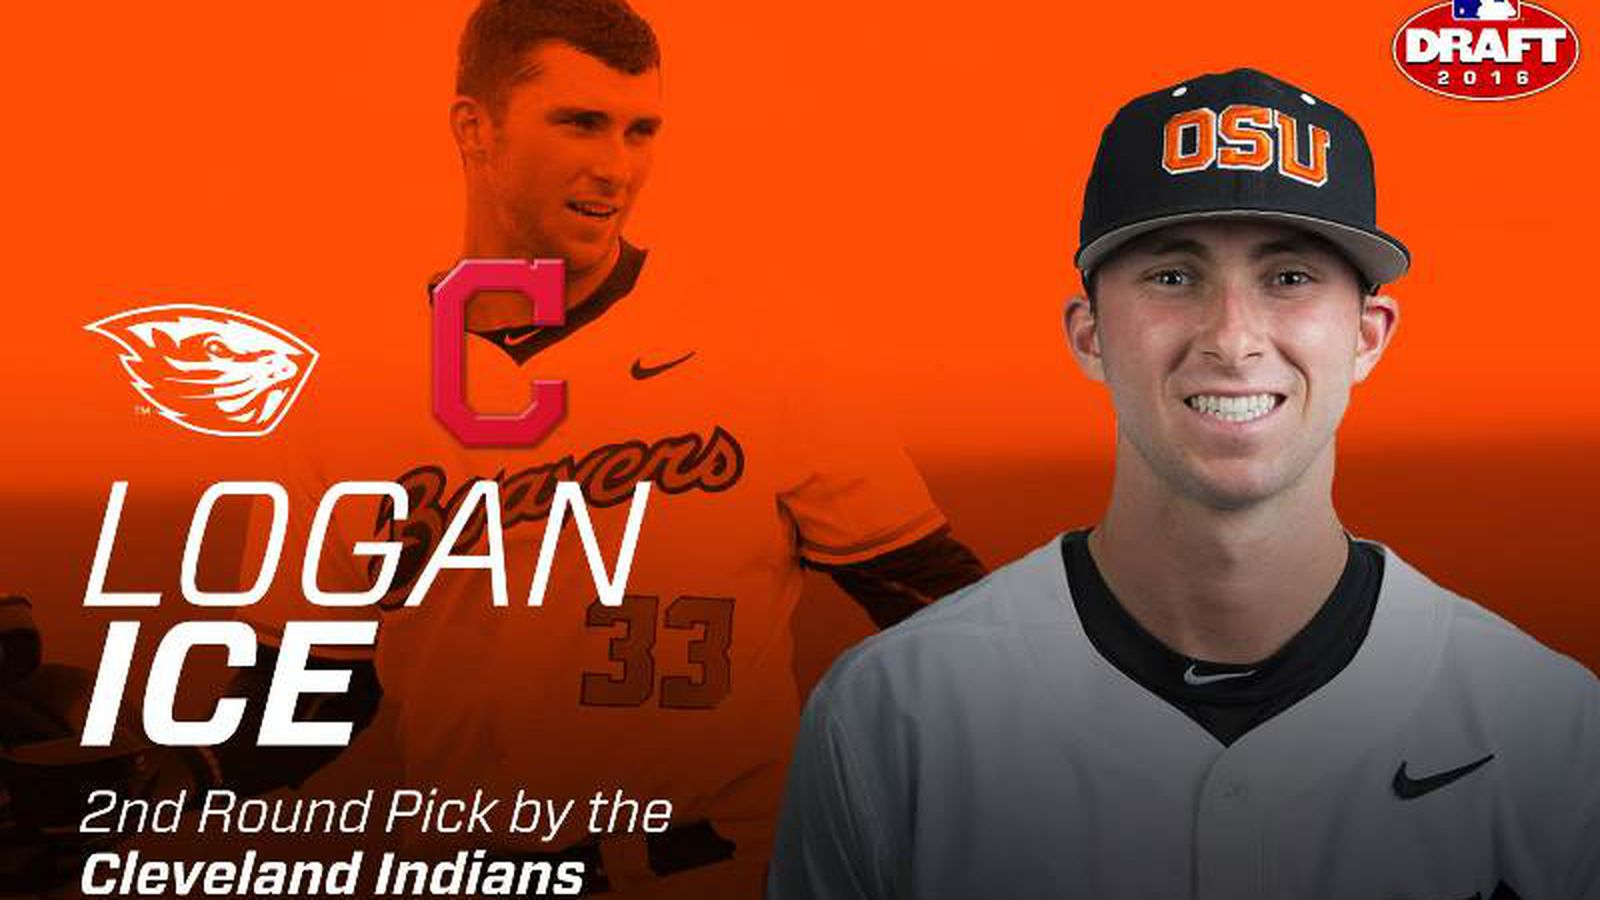 Logan_ice_drafted.0.0